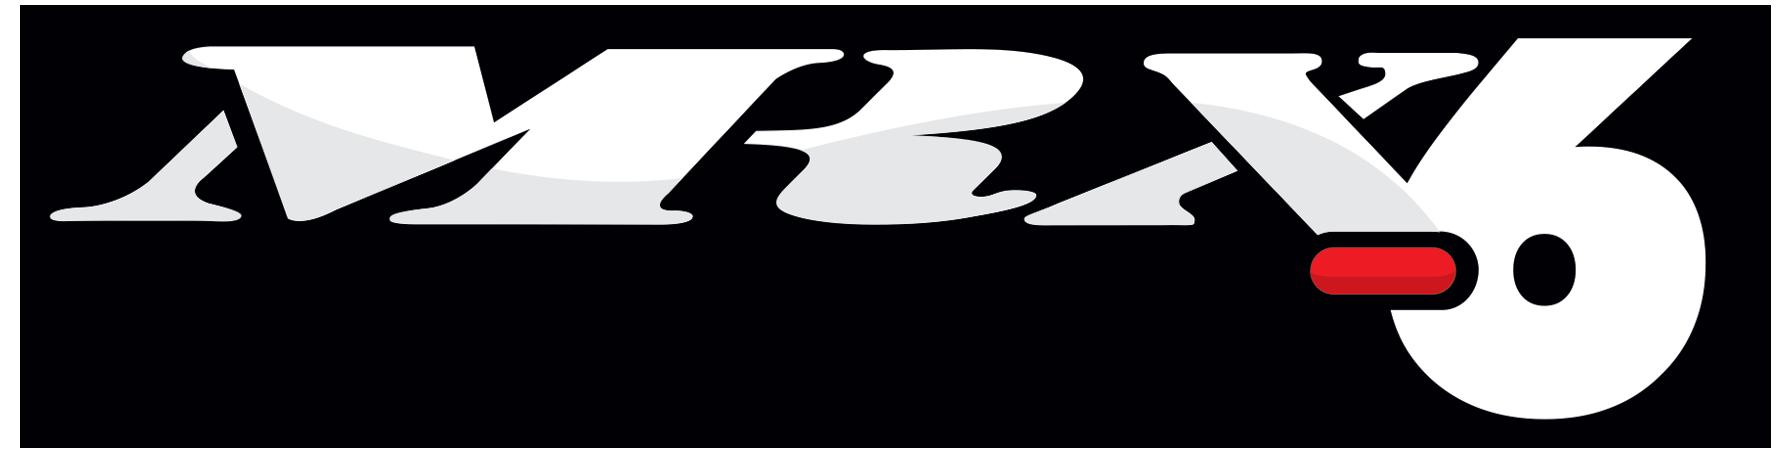 mrx6-logo.png